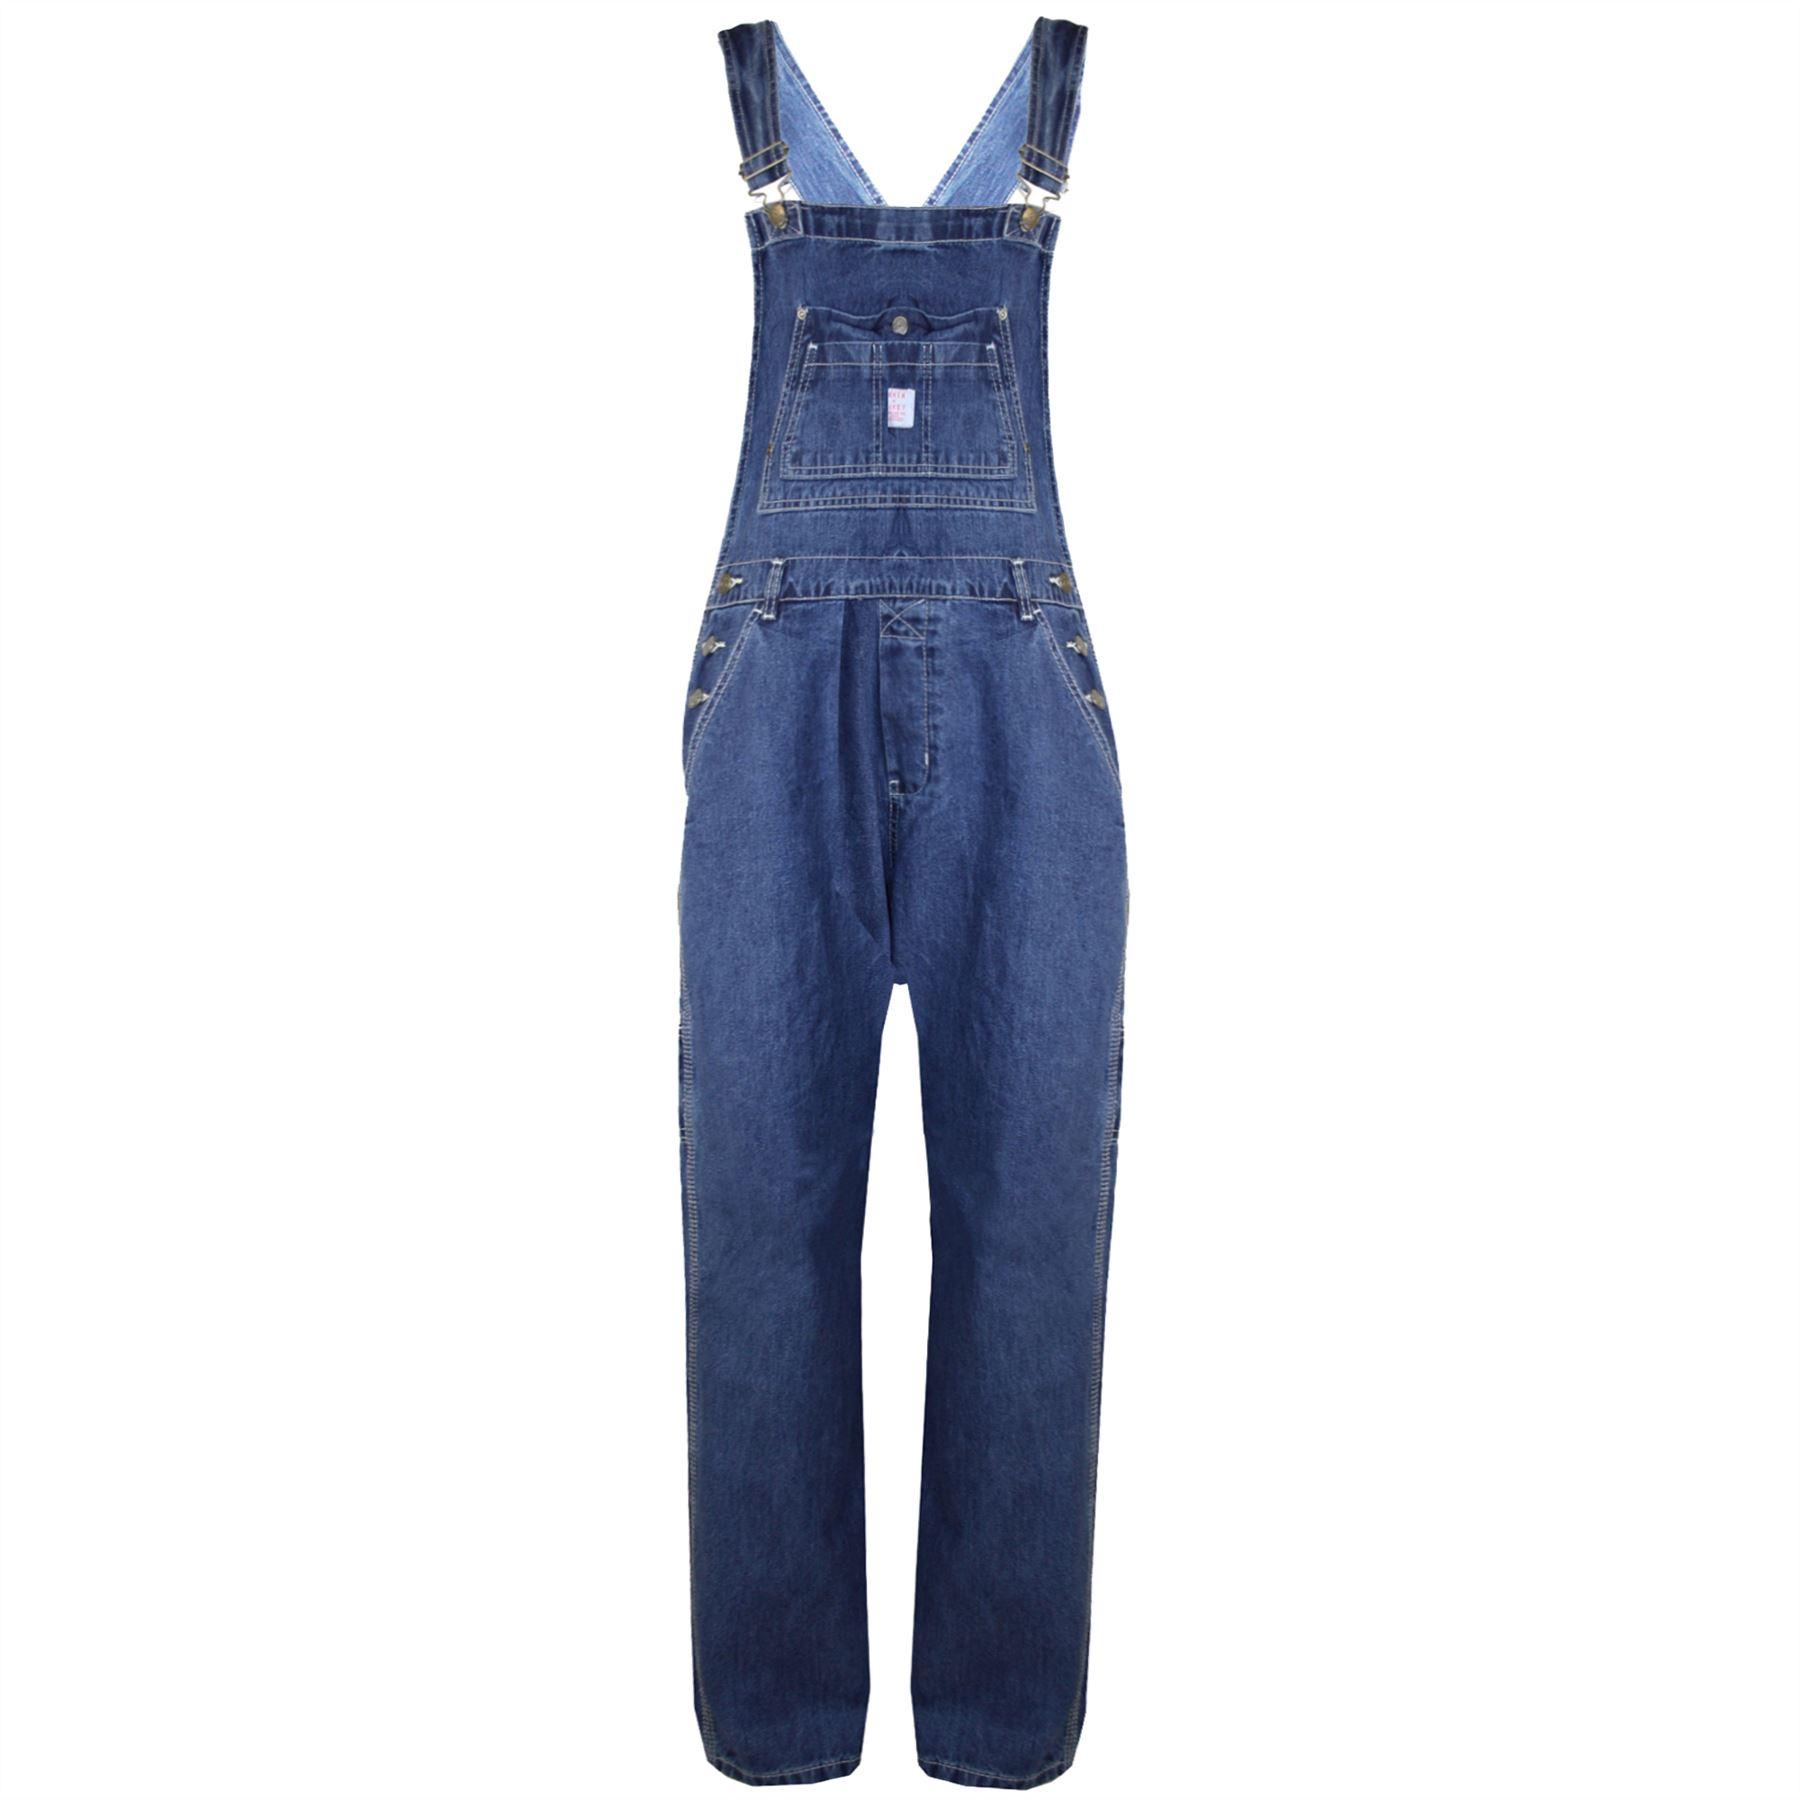 damen jeans schlabber denim helle waschung kinderkittel latzhose overall ebay. Black Bedroom Furniture Sets. Home Design Ideas